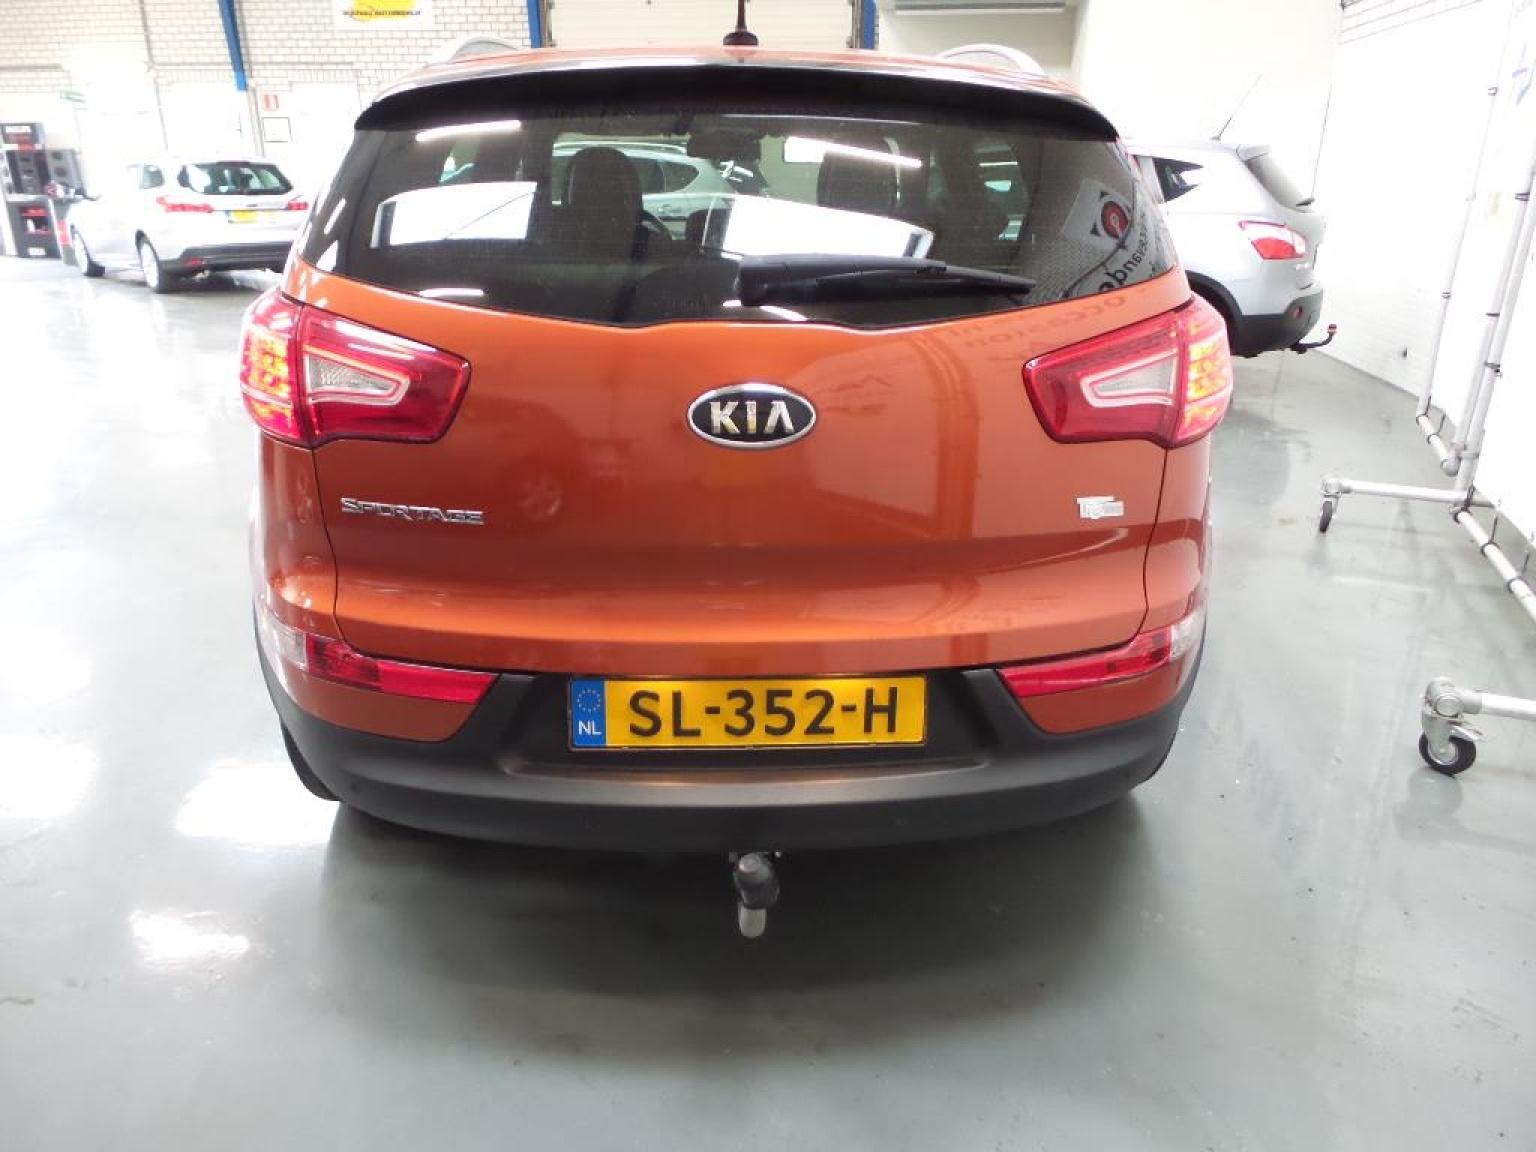 Kia-Sportage-2